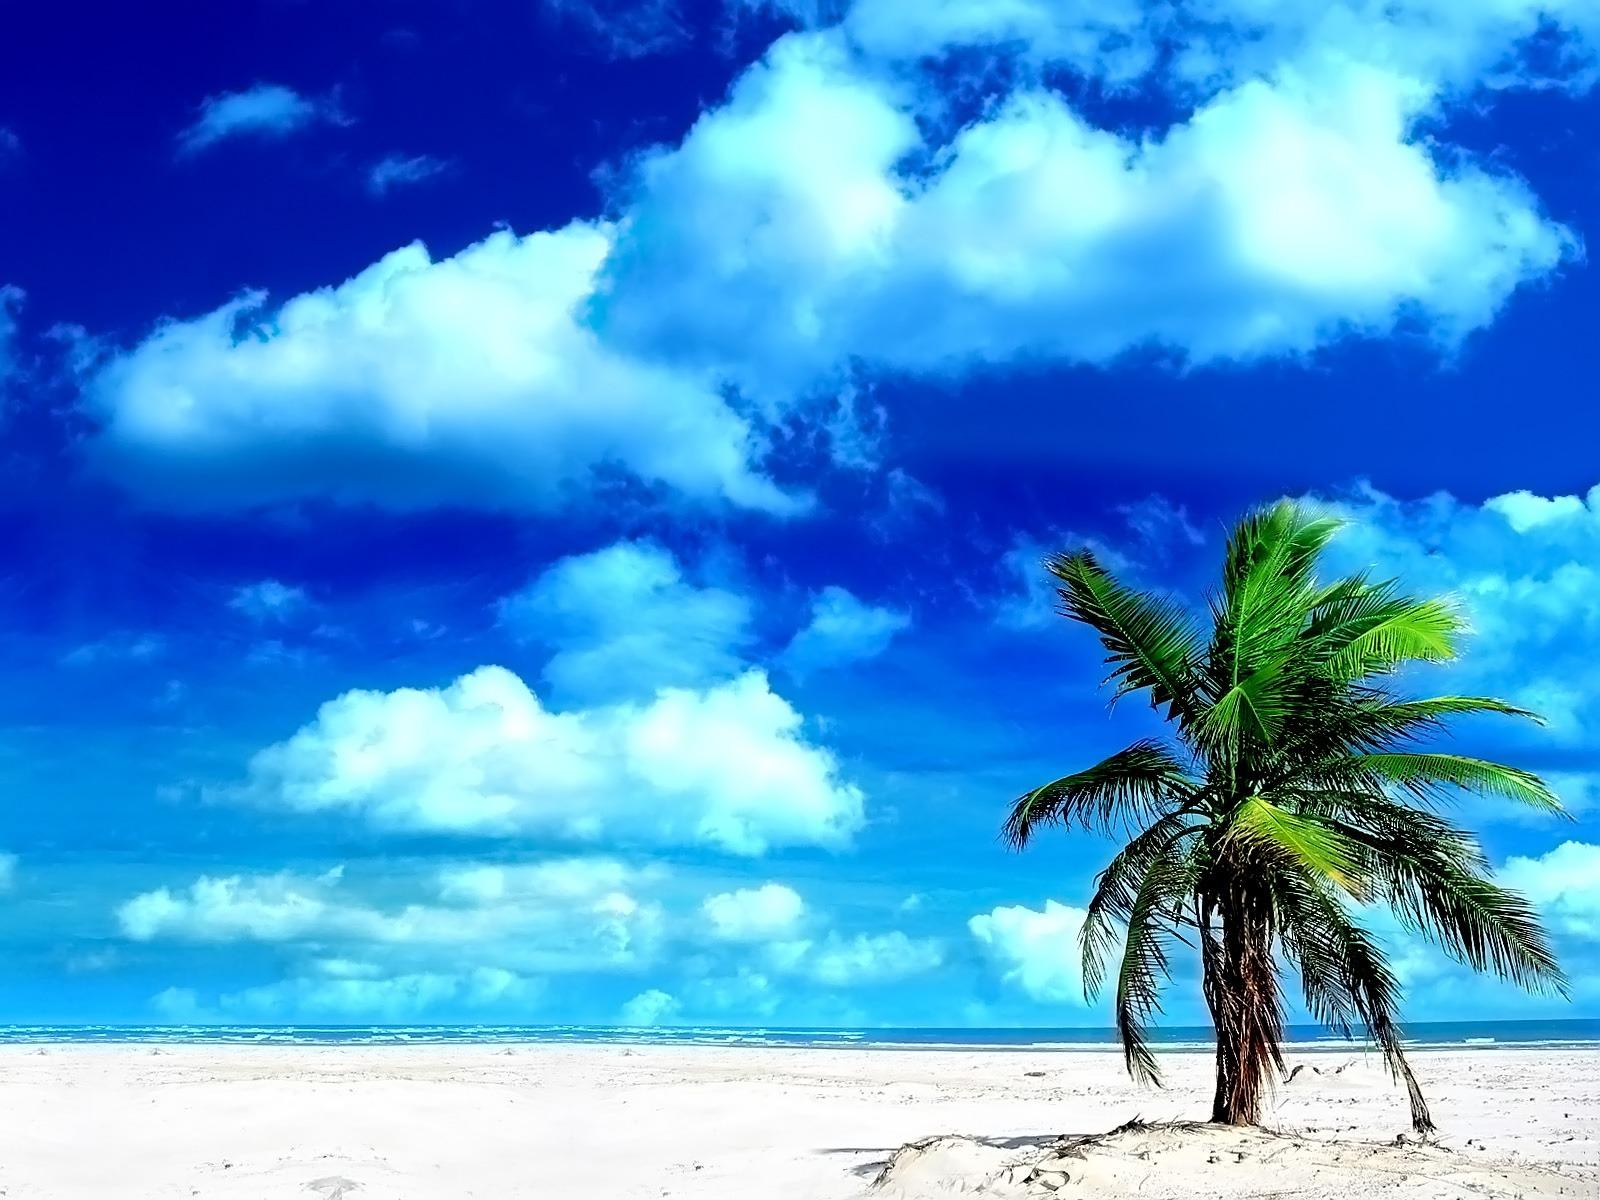 Fond d'ecran Palmier plage ensoleillée - Wallpaper